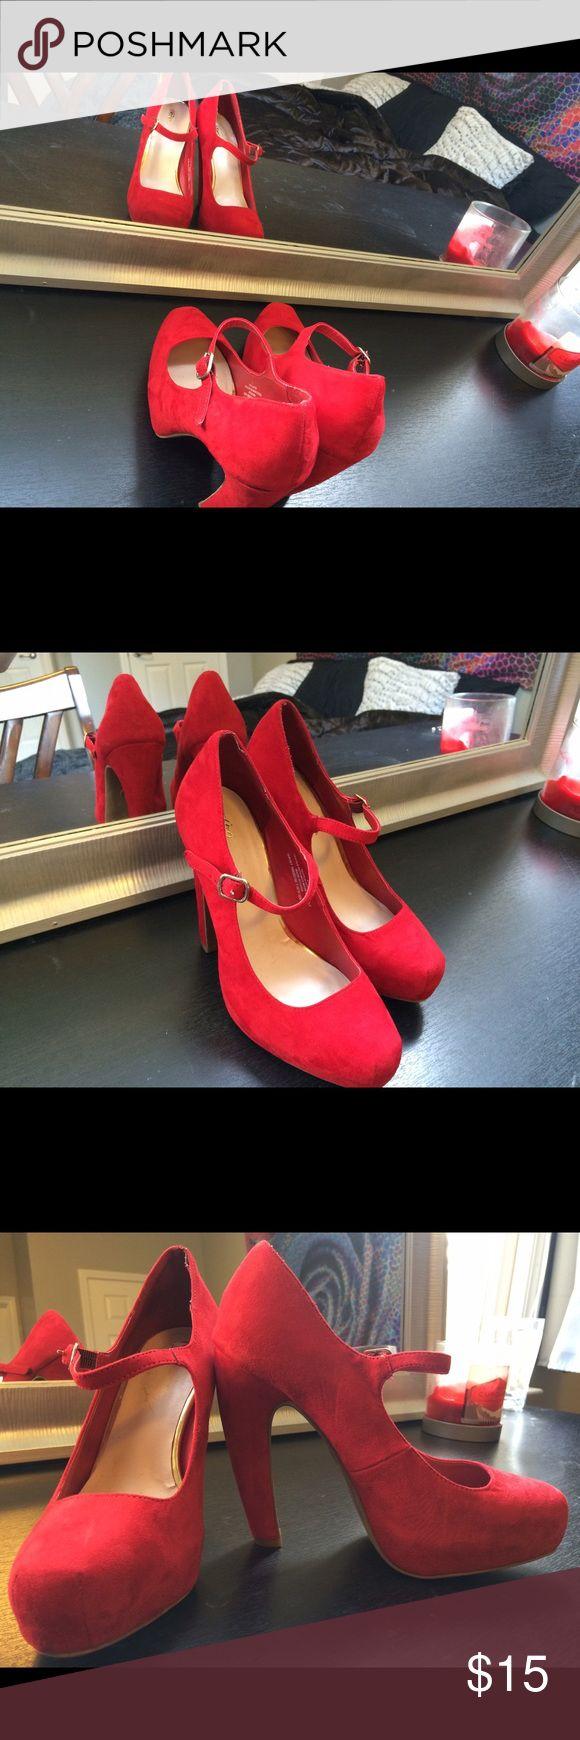 Bright red velvet heels 5in red heels Shoes Heels